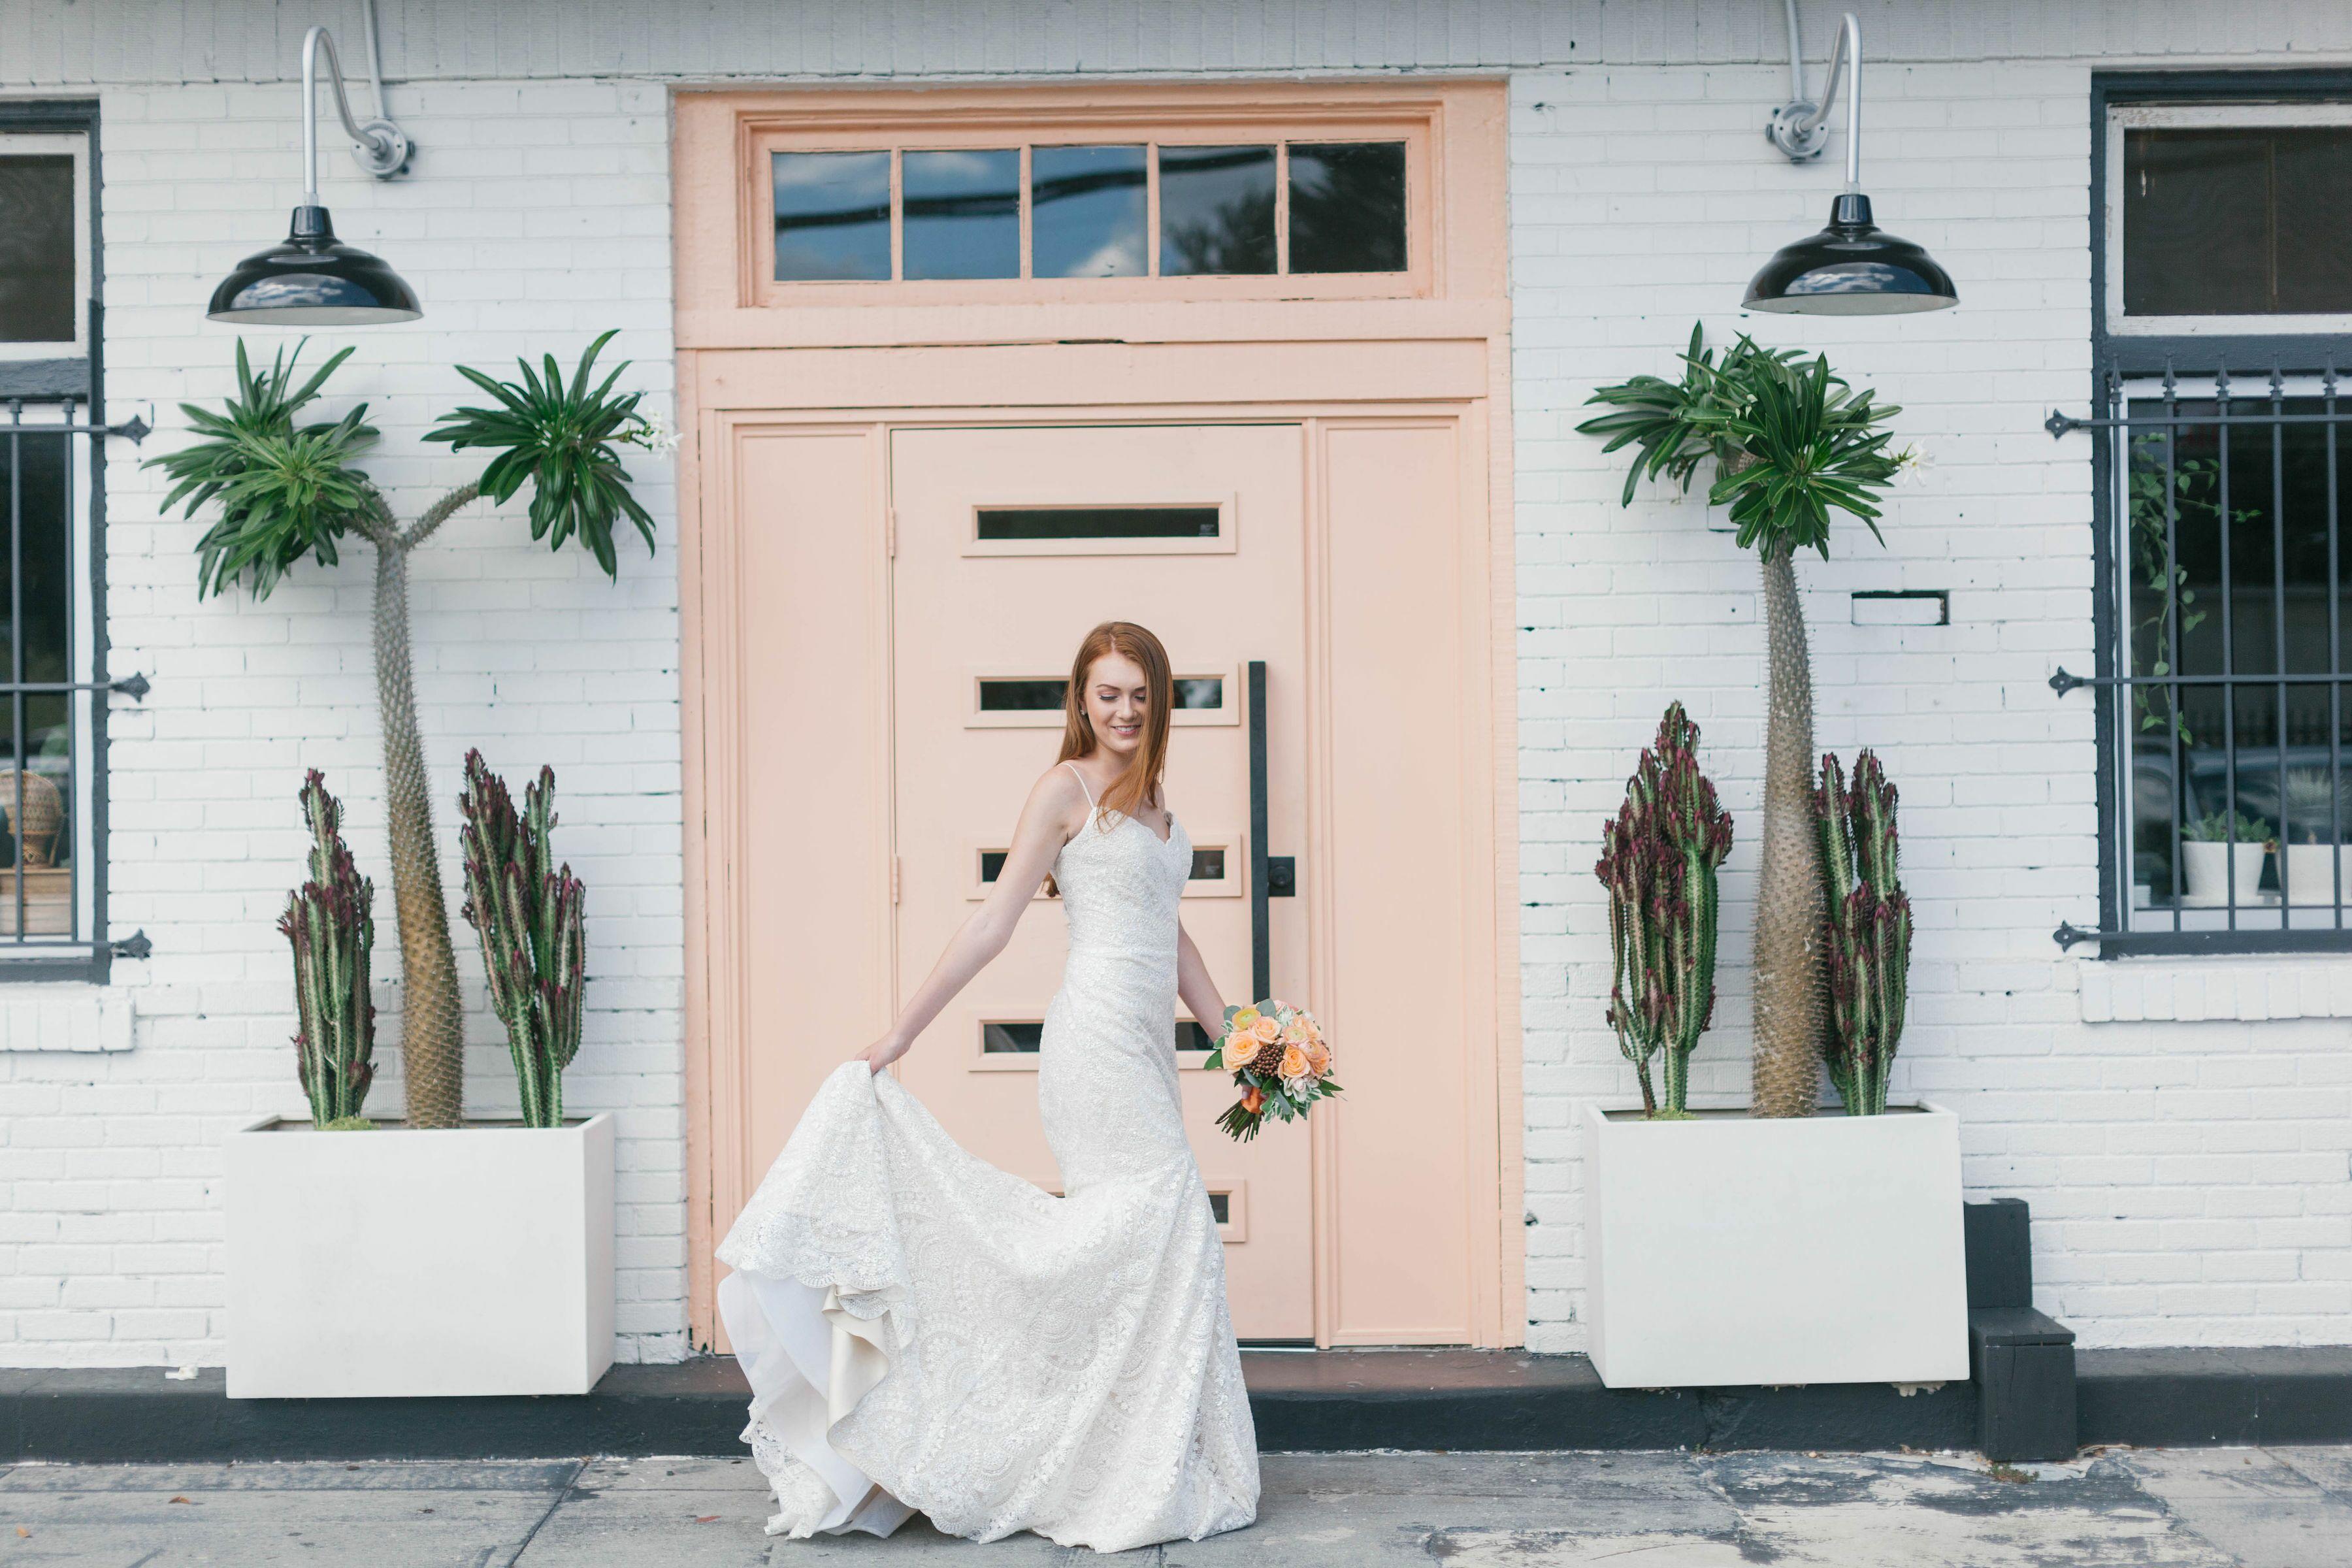 Malindy Elene Bridal Boutique Bridal Salons Tampa Fl